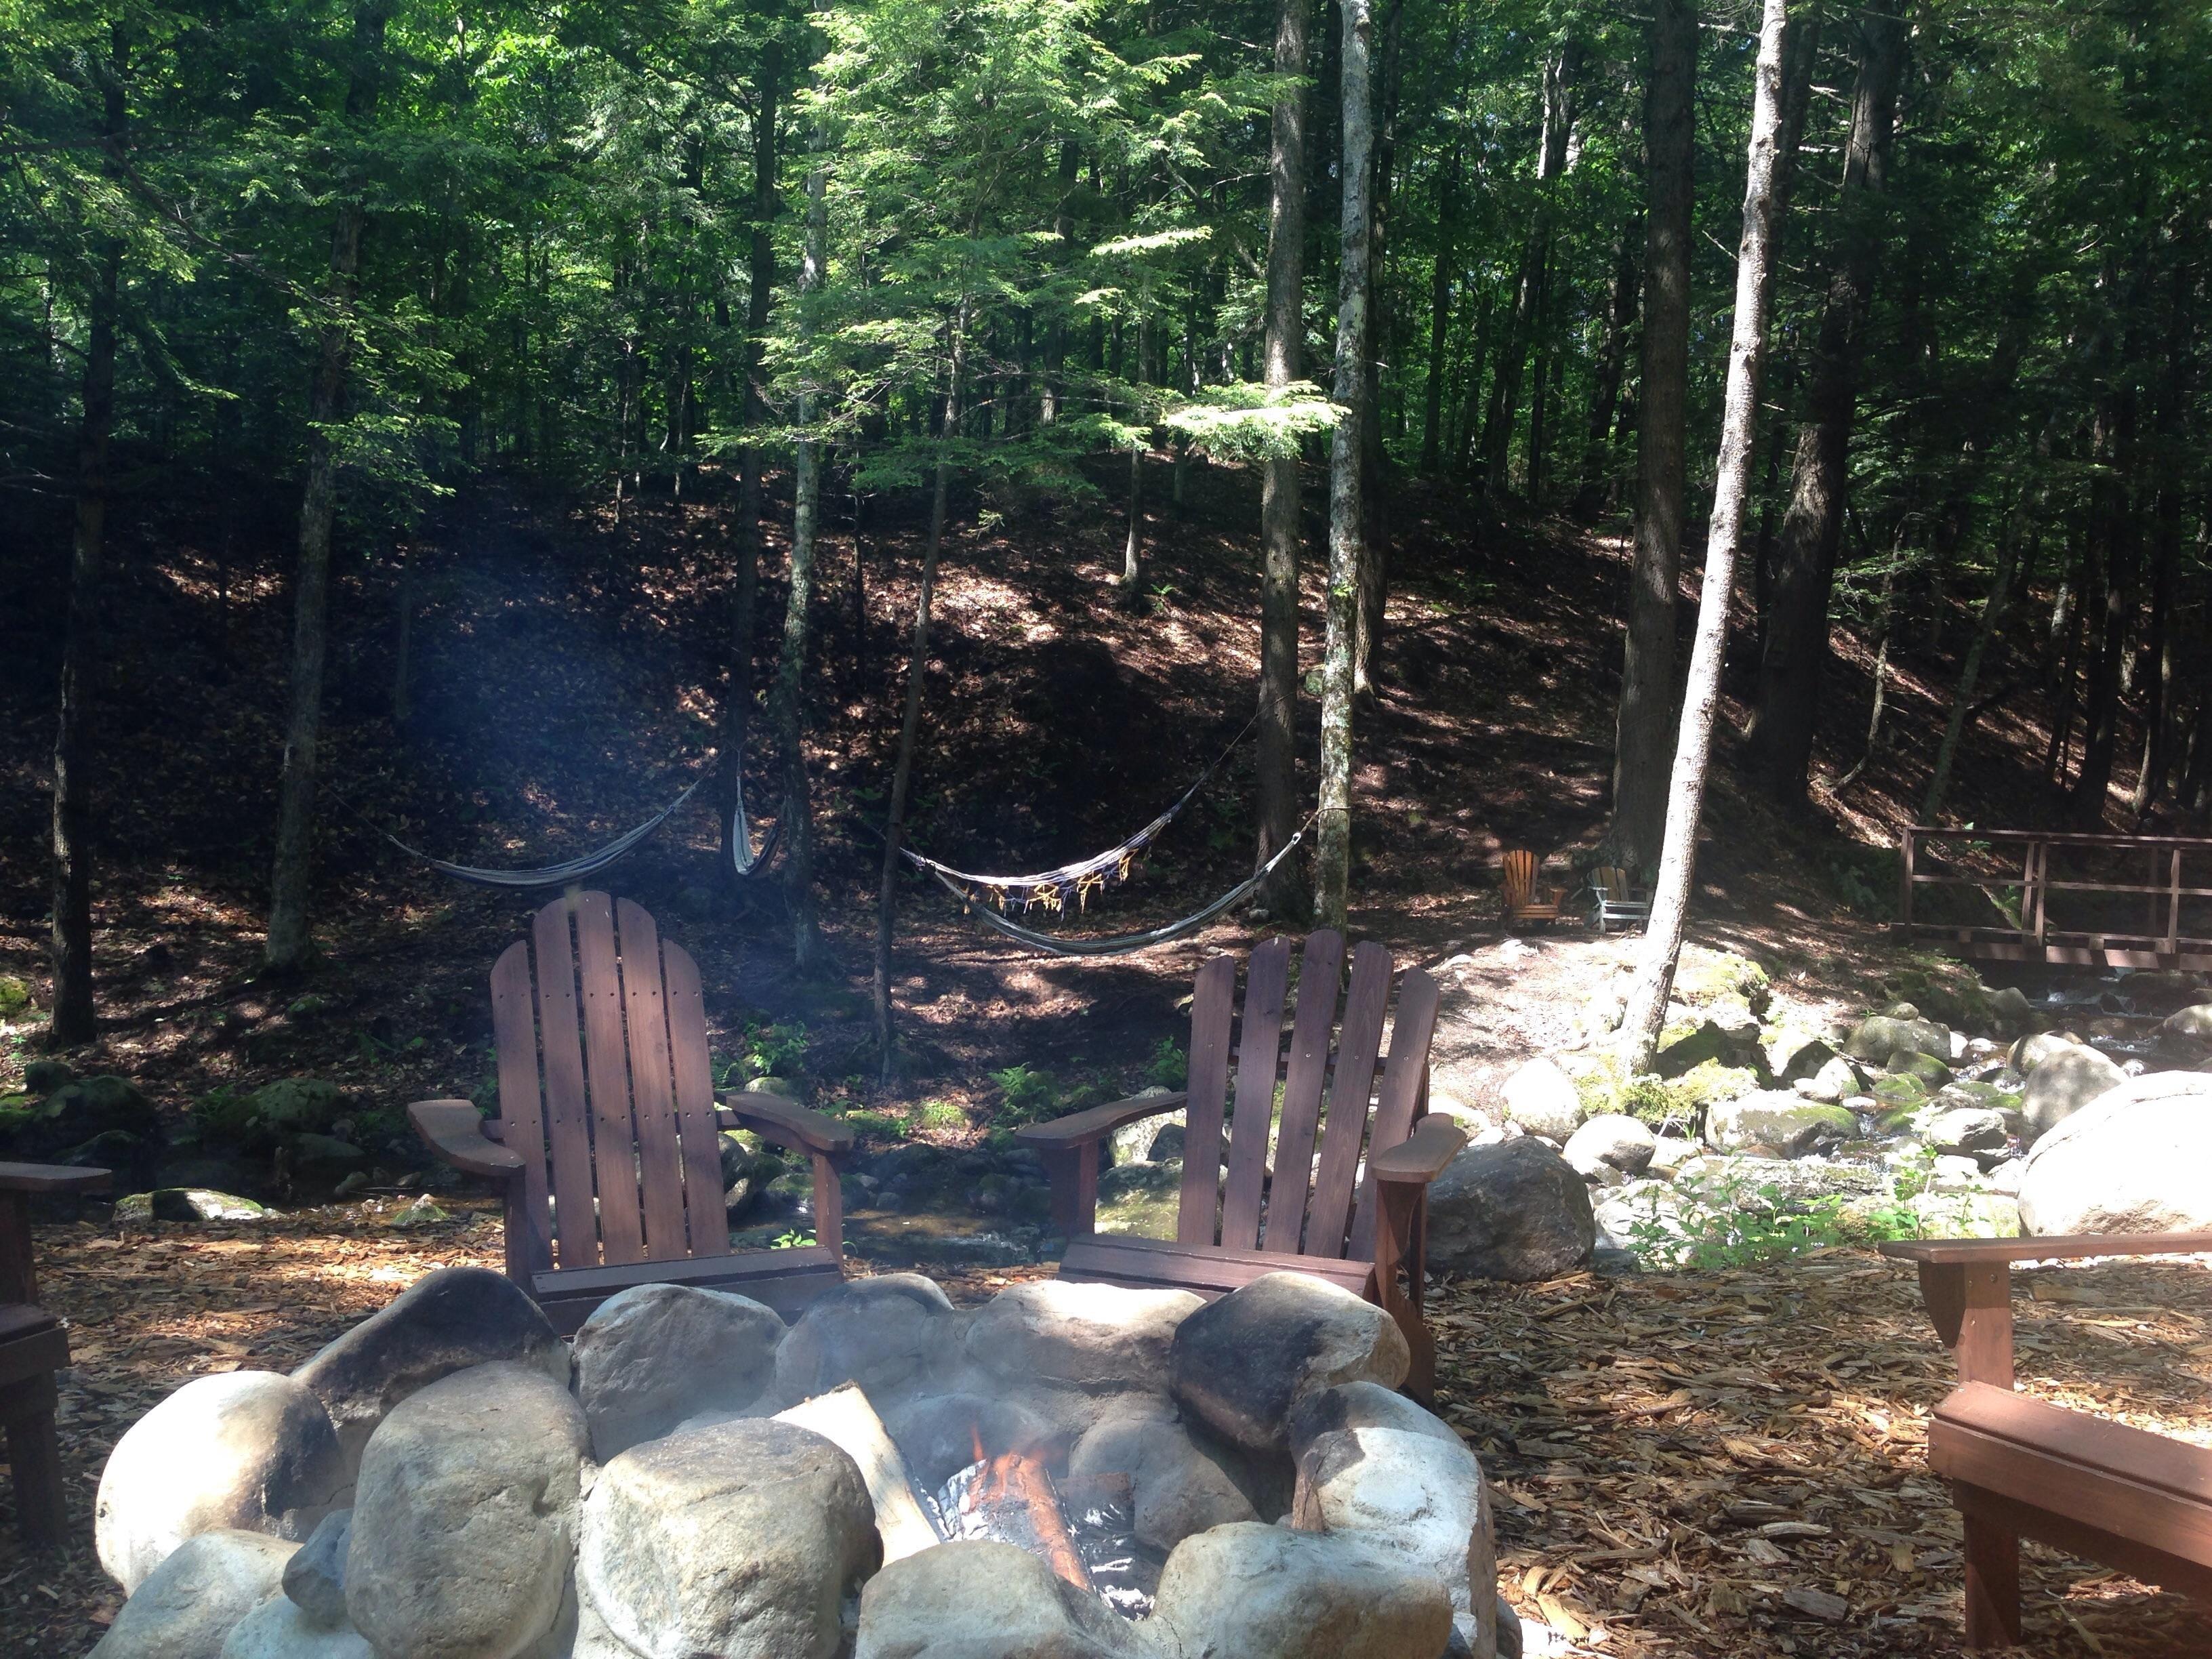 Orenda - all inclusive glamping in Upstate NY | Upstate ny ...